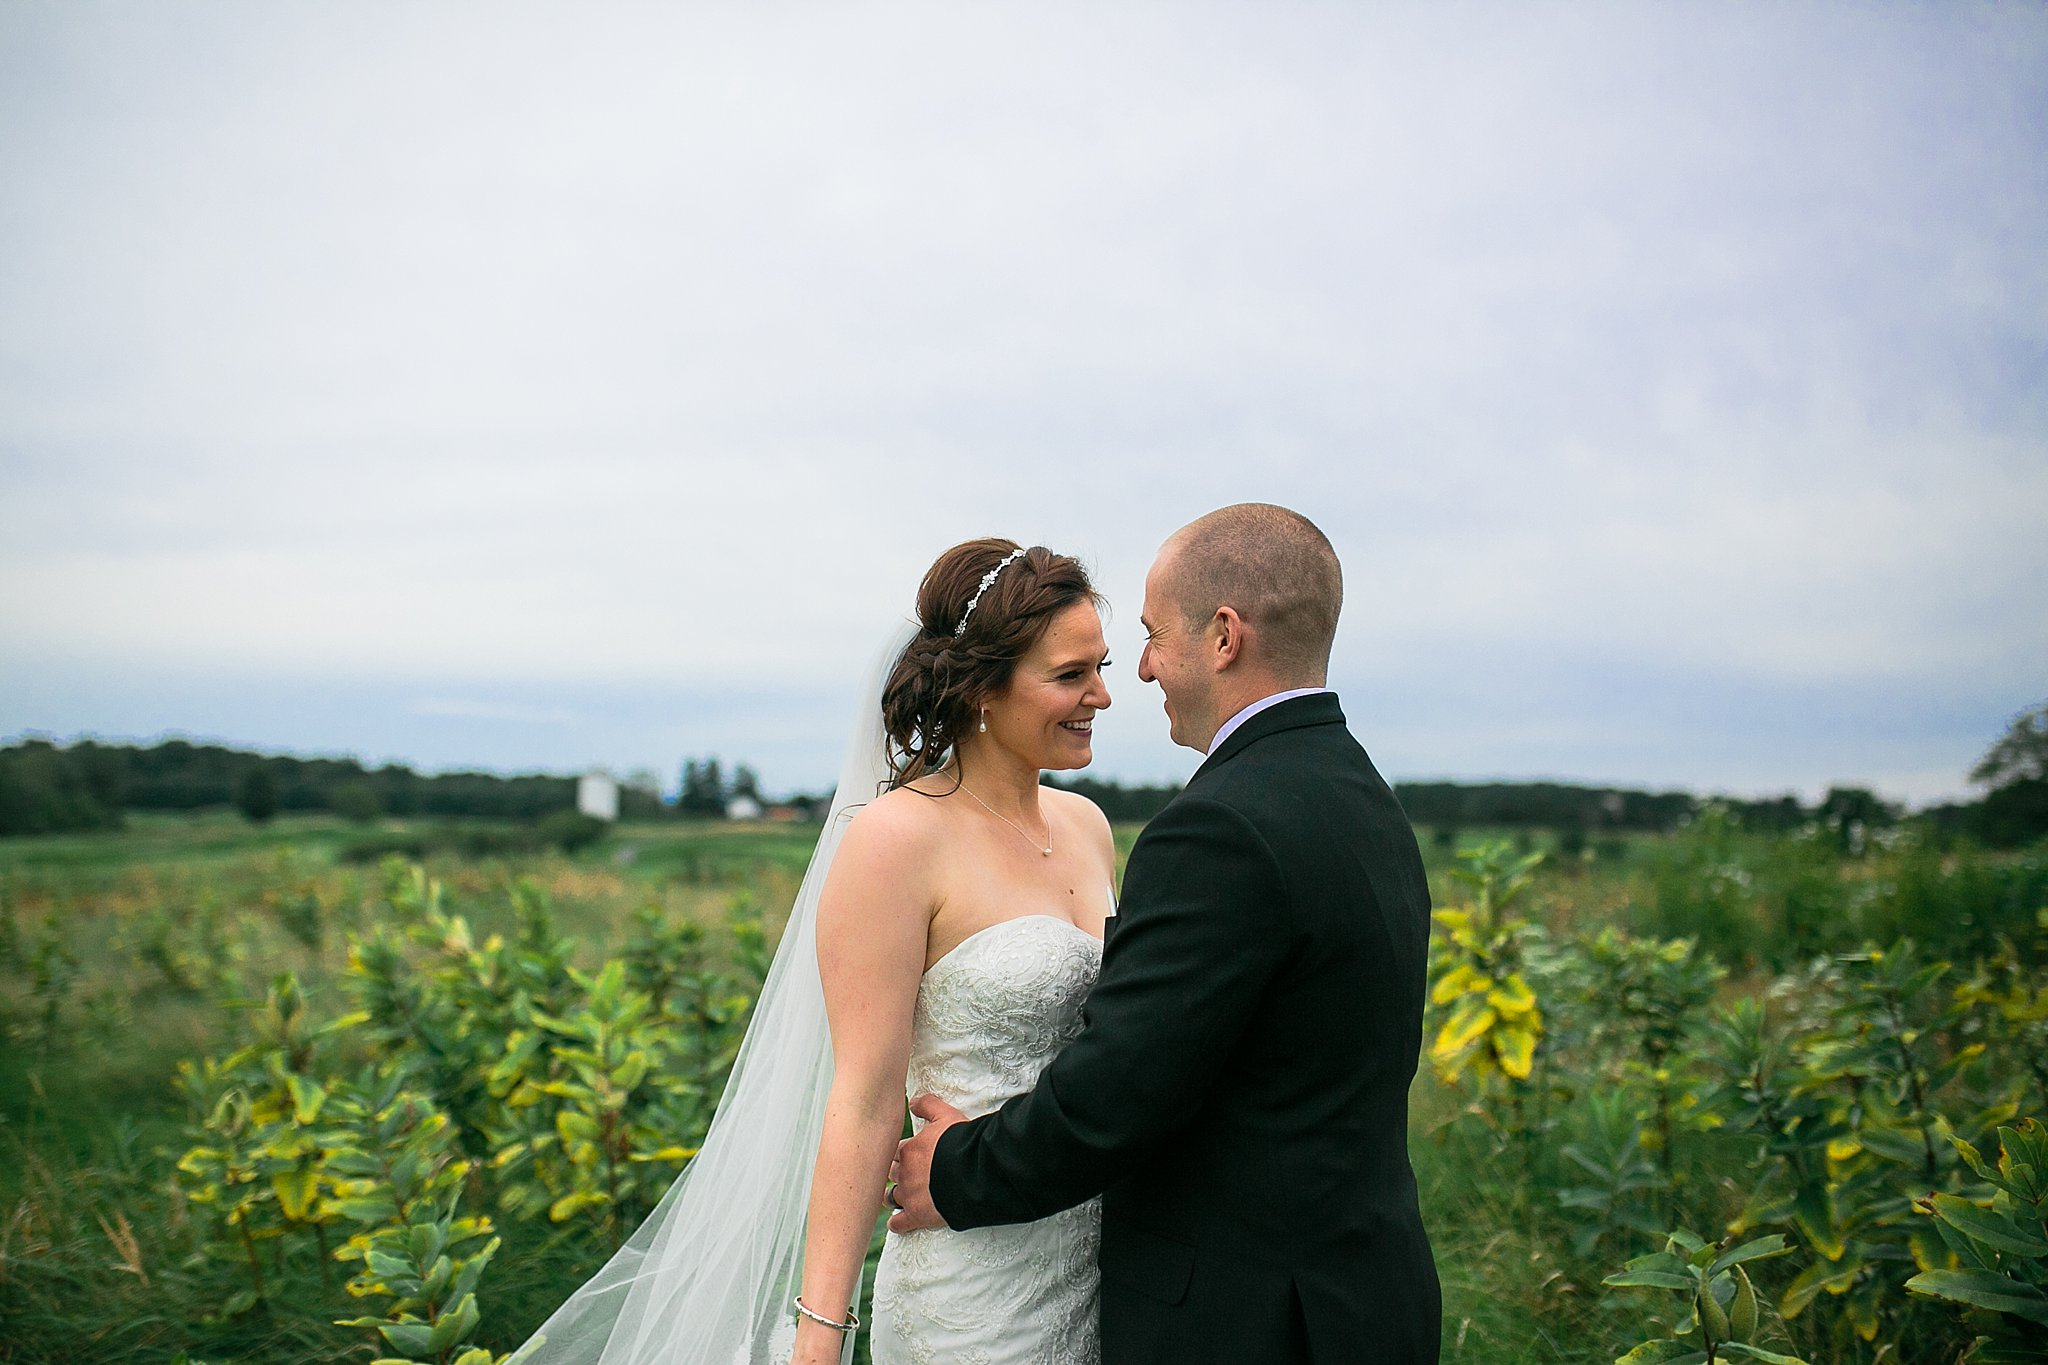 Links at Unionvale Wedding Lagrangeville Wedding Hudson Valley Wedding Photographer Sweet Alice Photography52.jpg